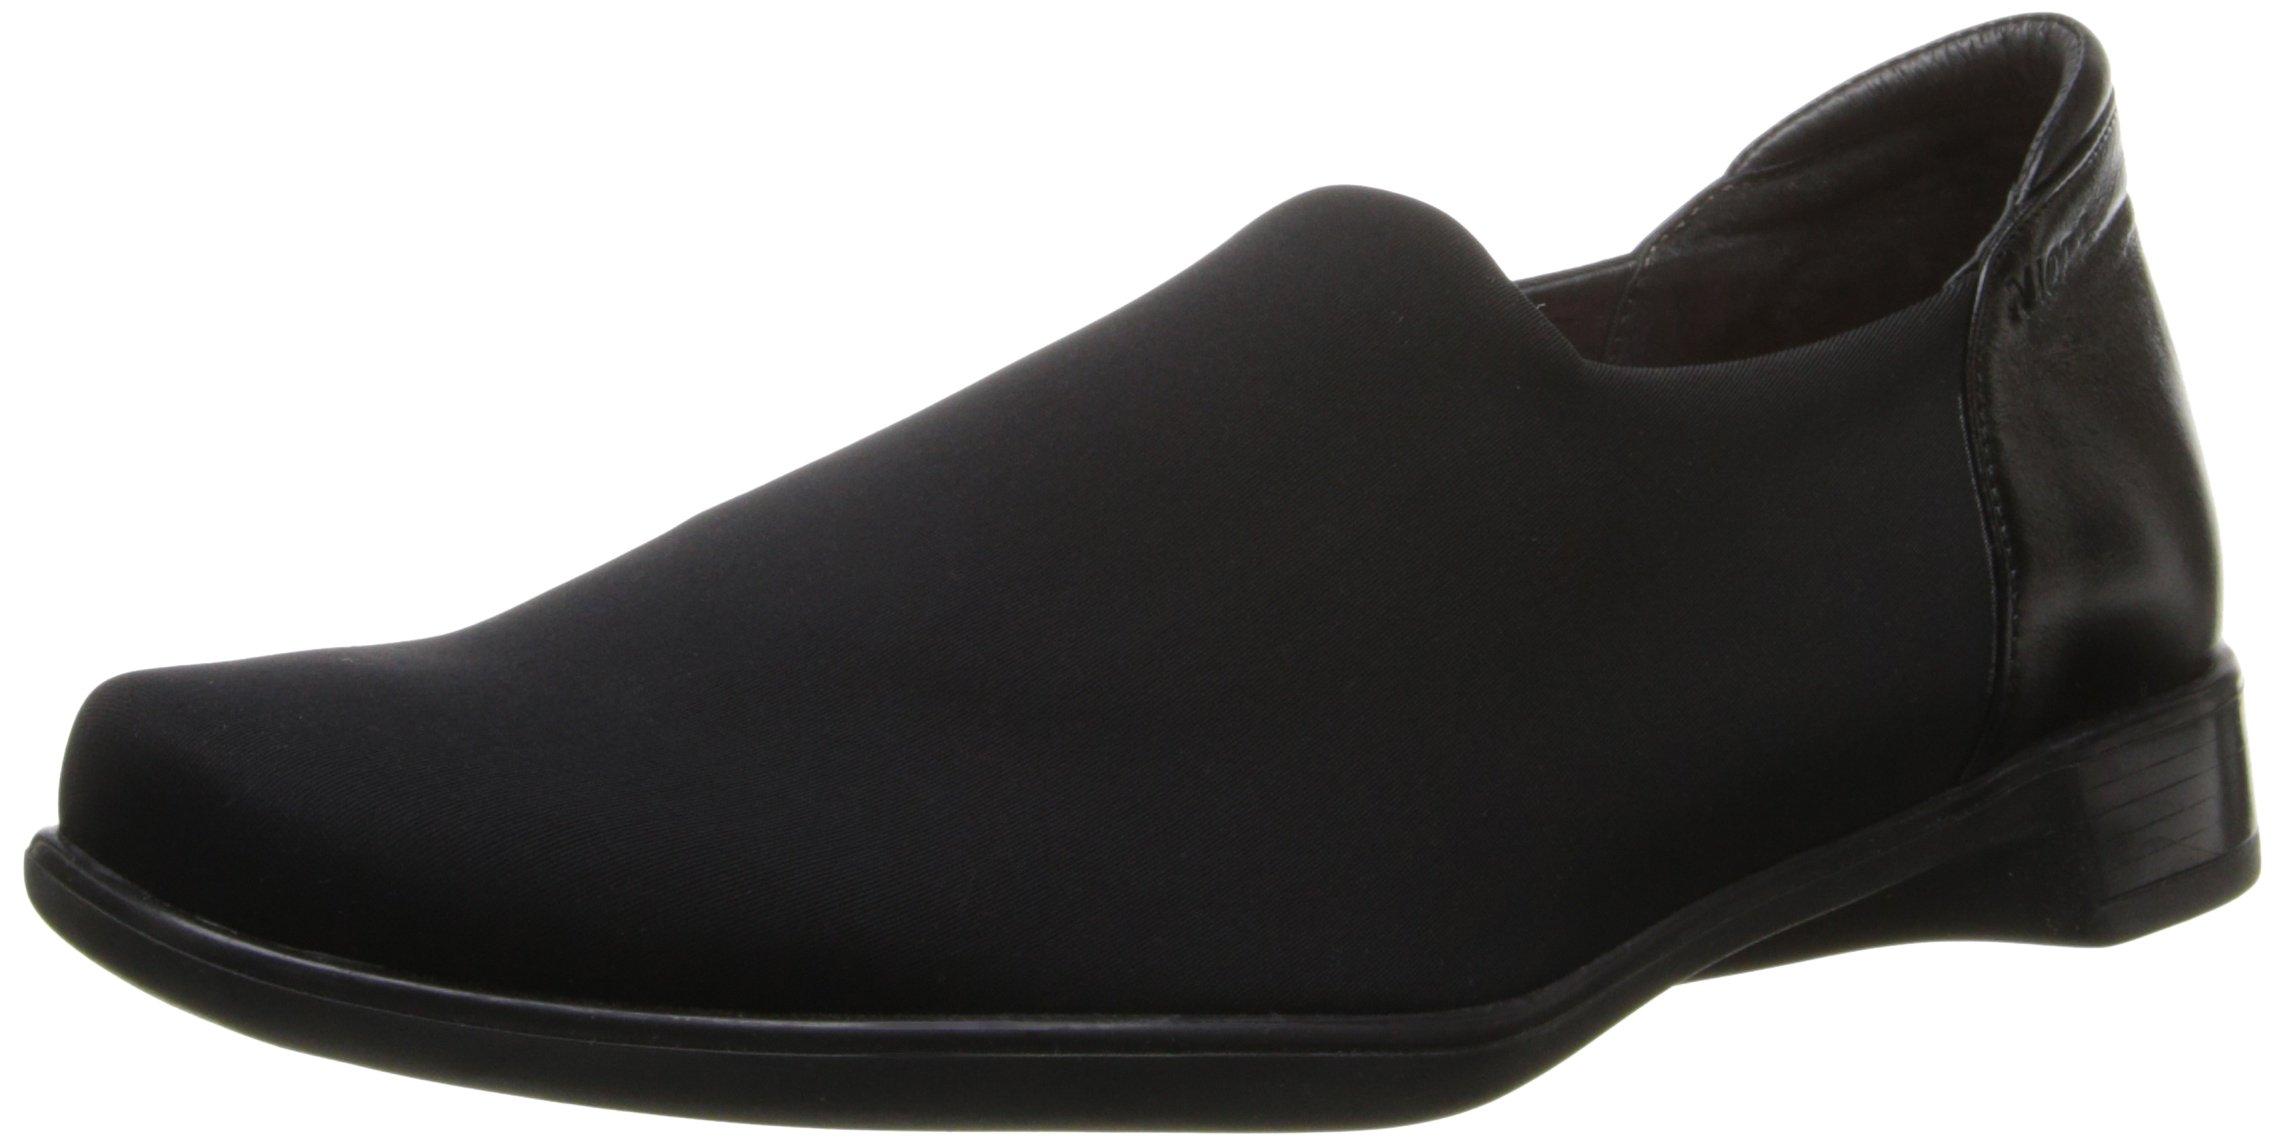 Naot Footwear Women's Noble Black Stretch/Black Midnight Leather Flat 38 (US Women's 7) M